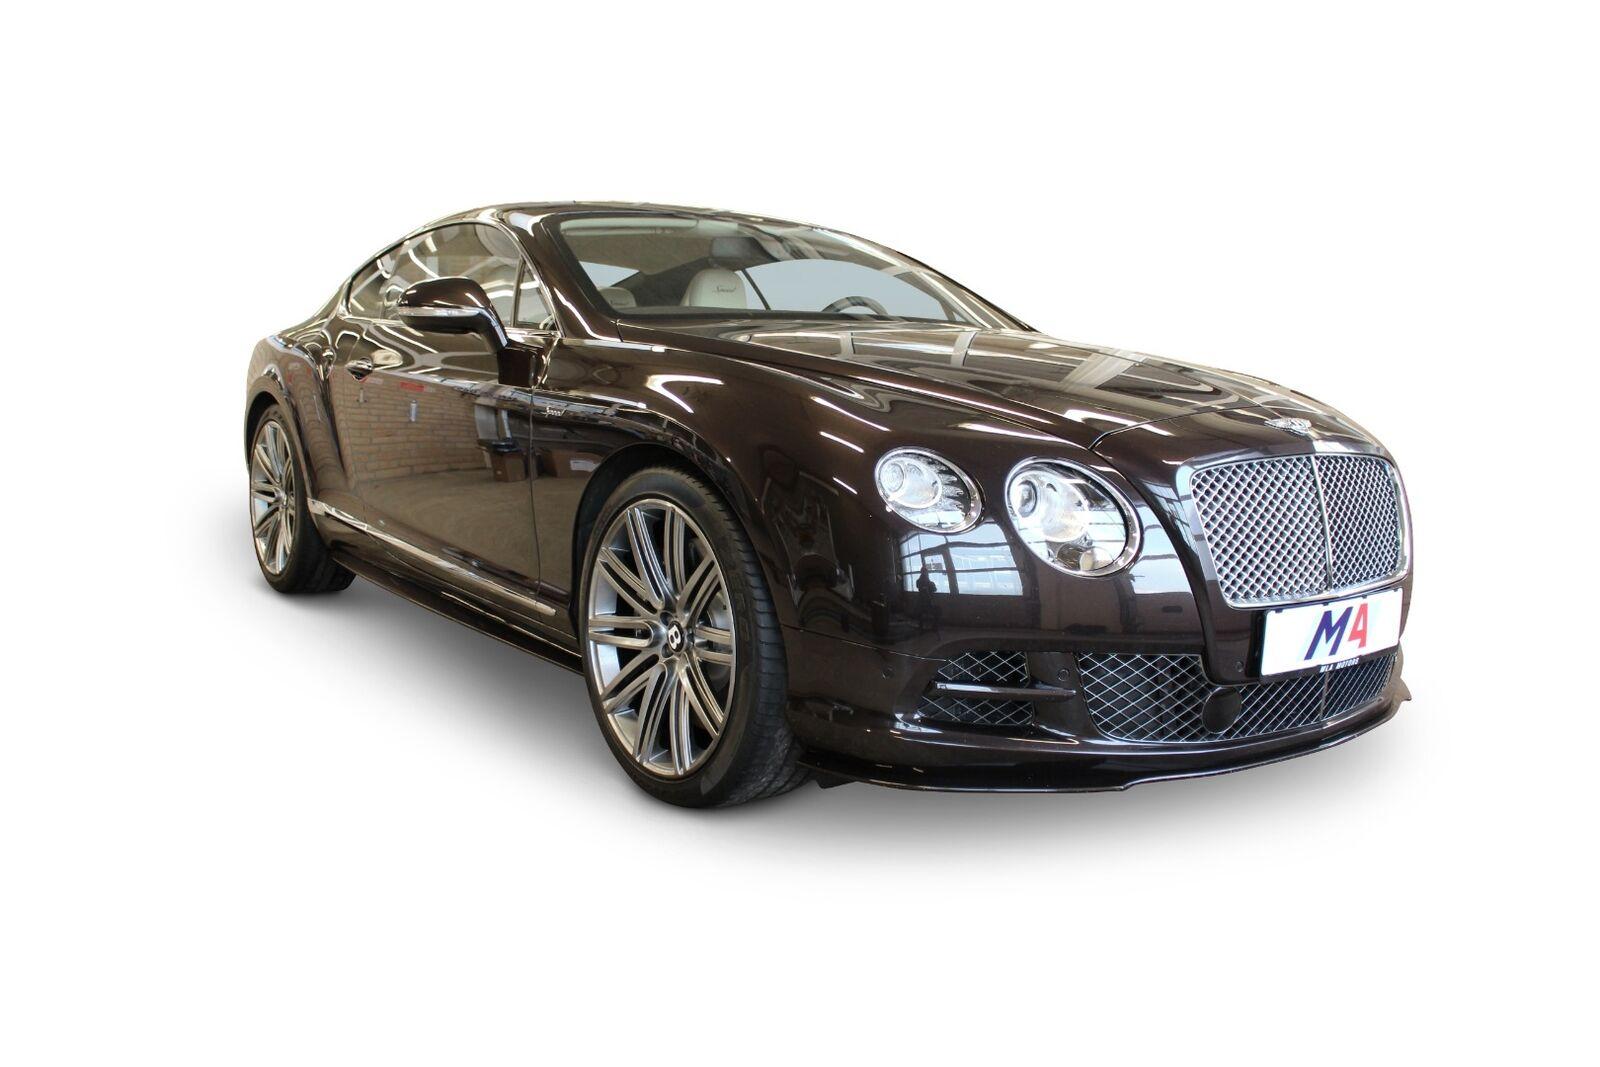 Bentley Continental GT 6,0 W12 Speed aut. 2d